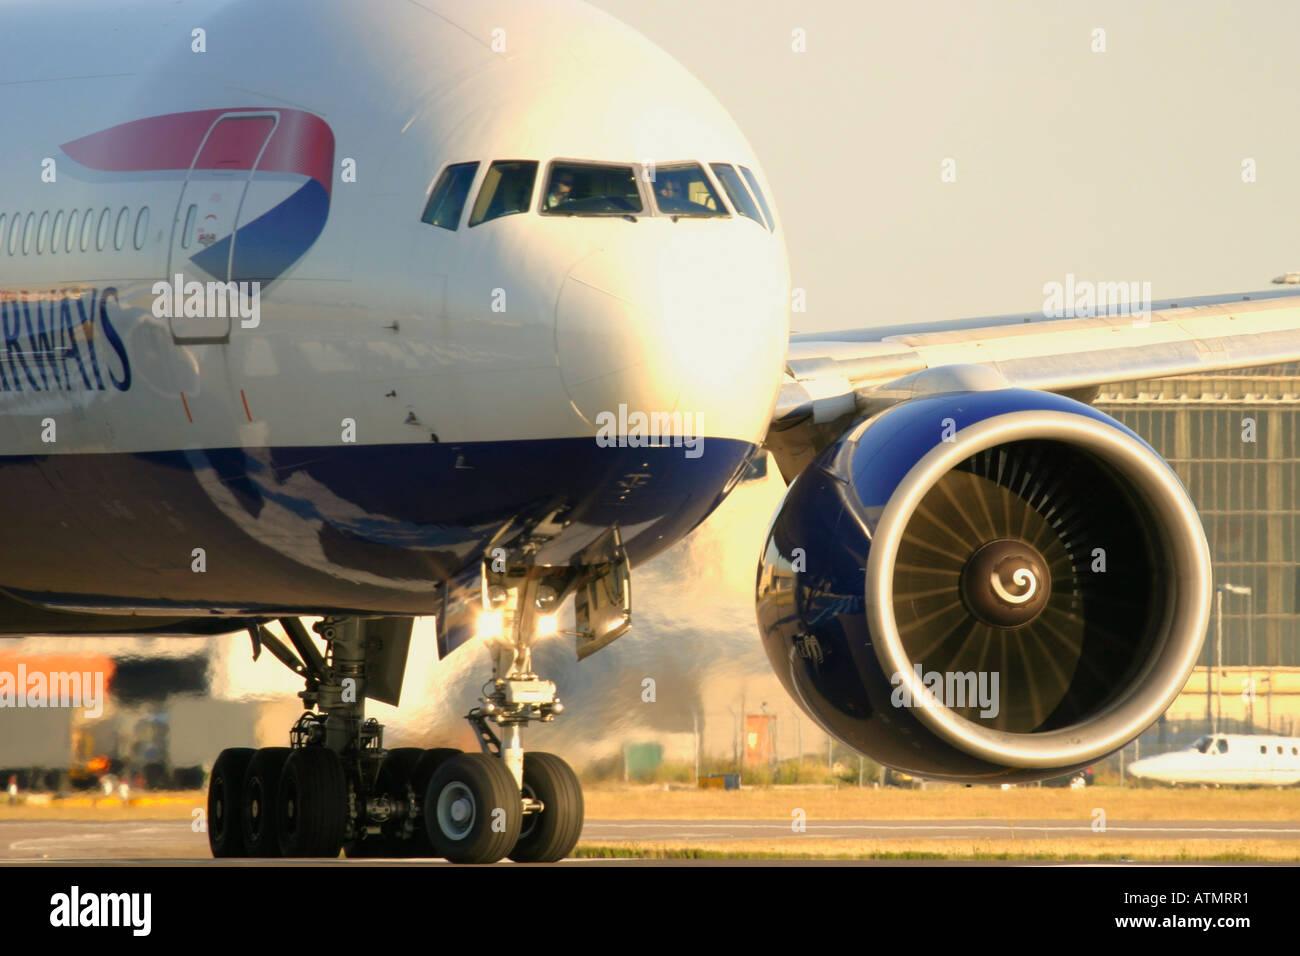 Close-up of British Airways Boeing 777-236/ER at London Heathrow Airport - Stock Image